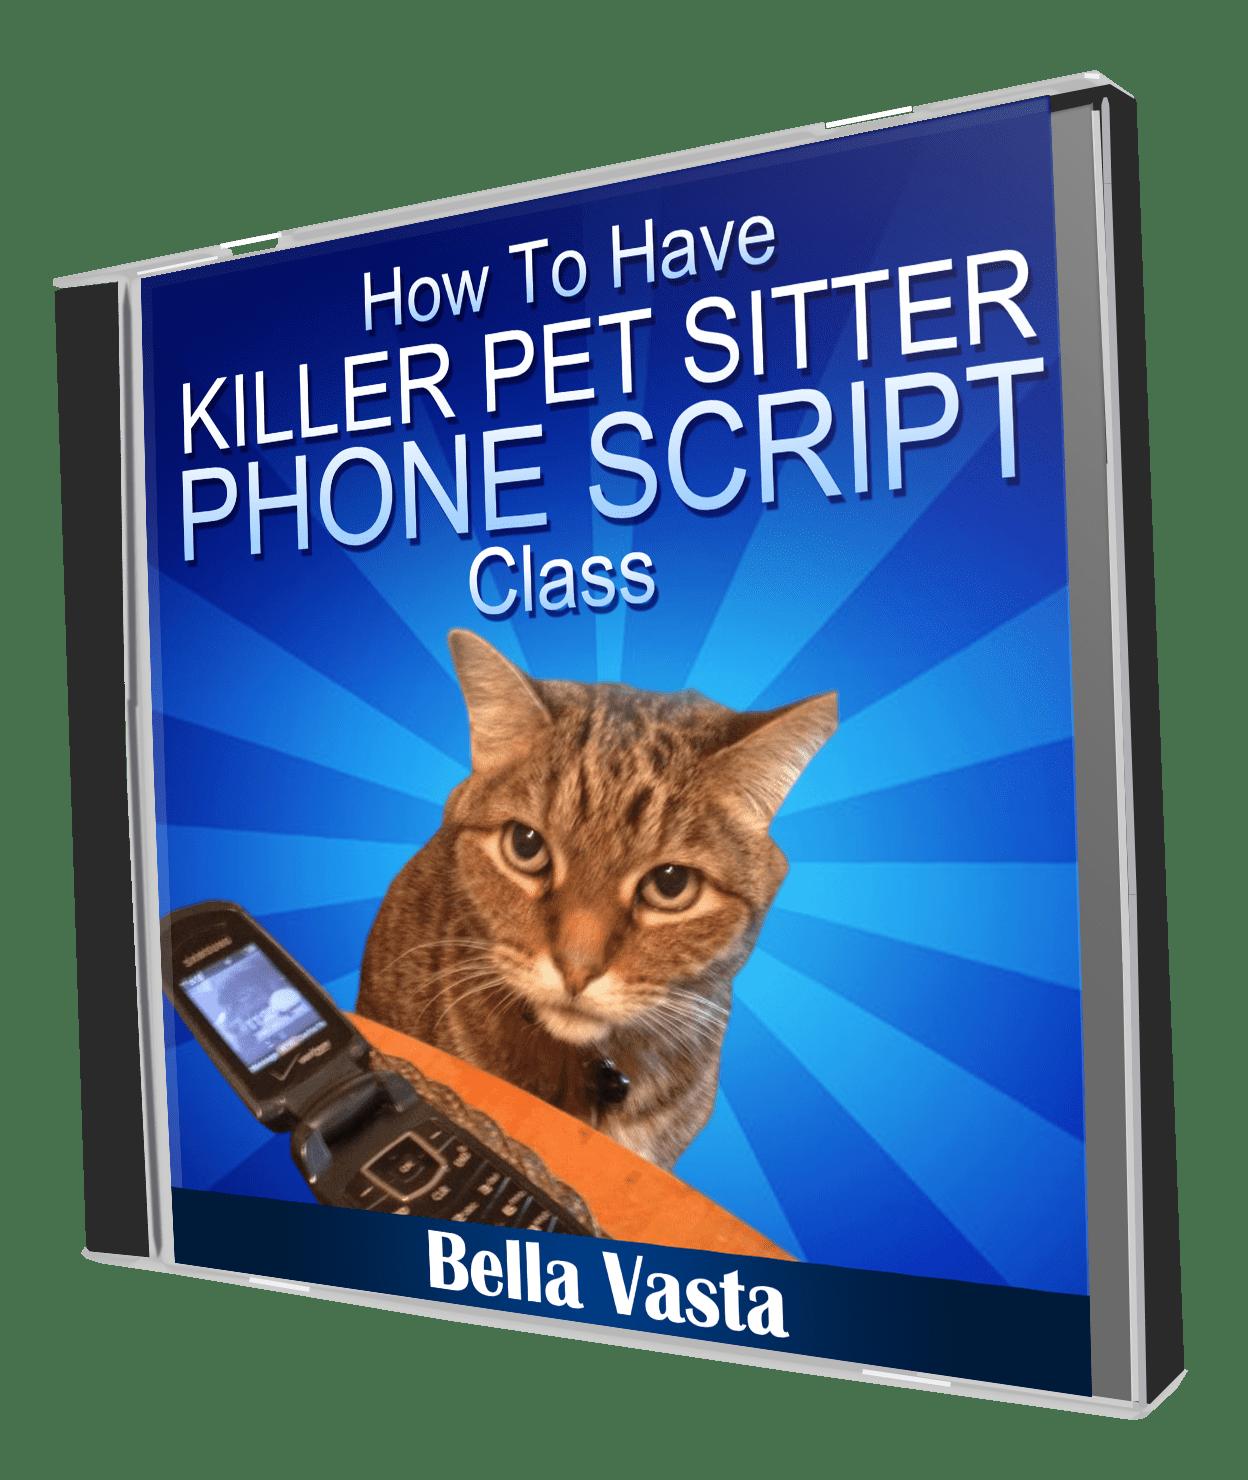 Pet Sitter Phone Script